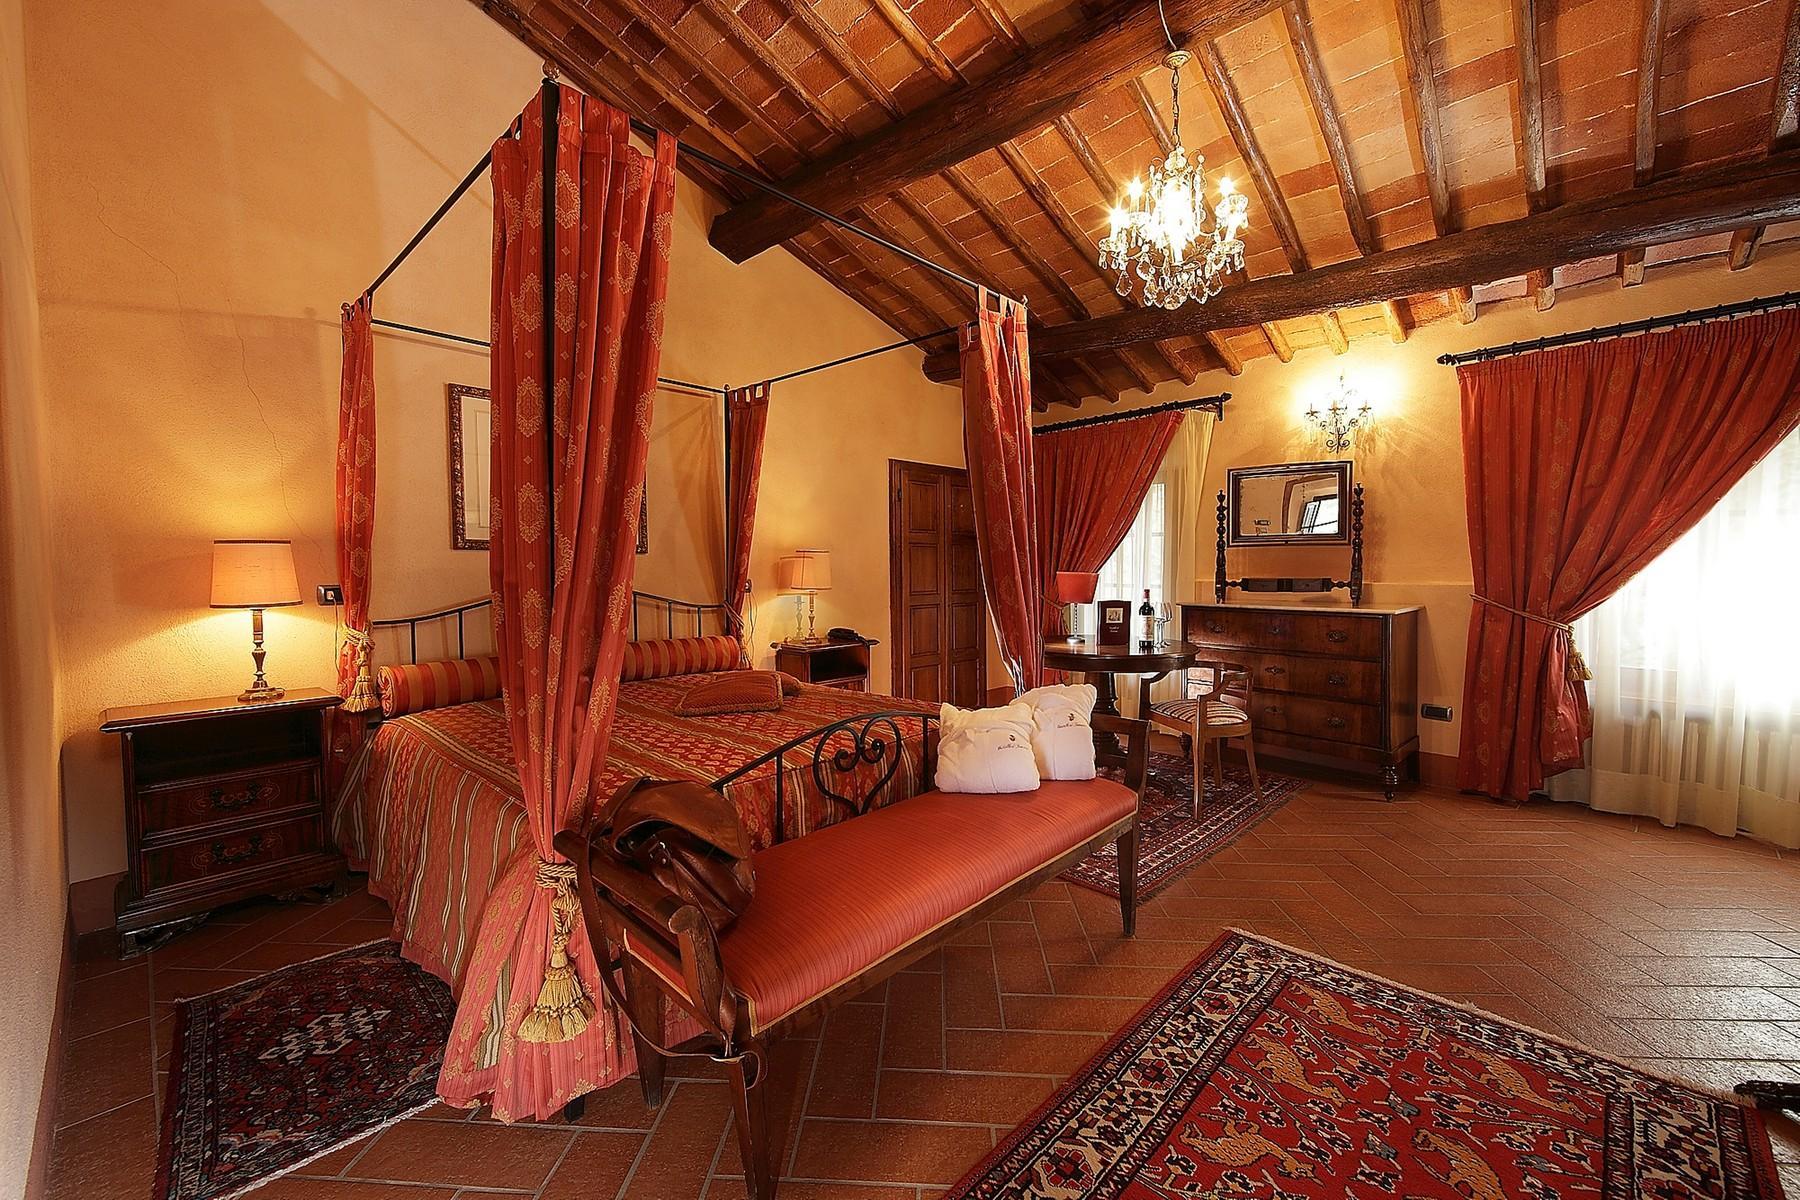 Exclusive manor in the heart of Chianti Classico - 16